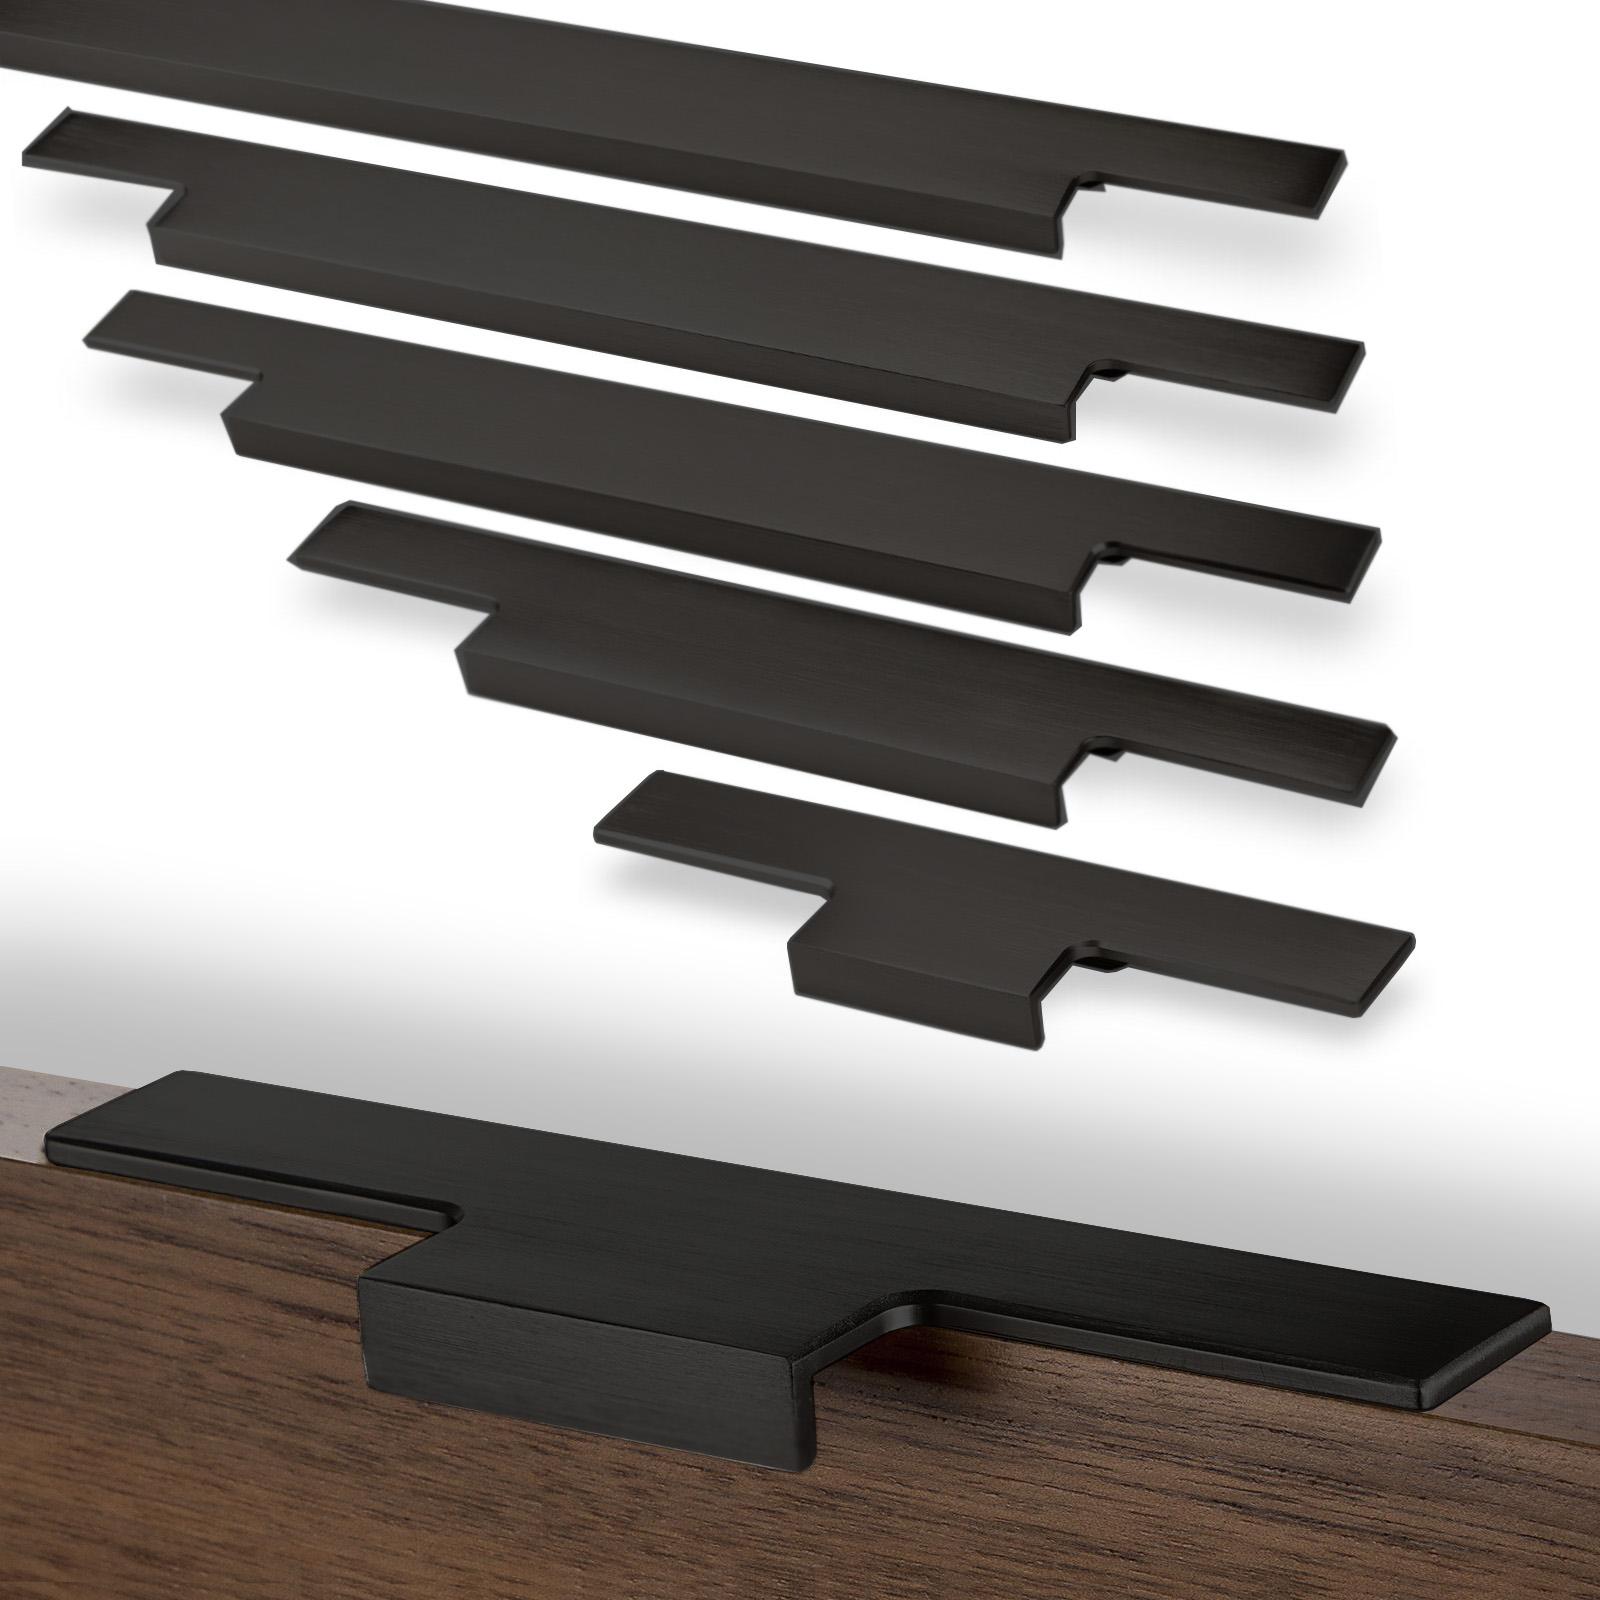 sch co alu competence m belgriff slim schubladengriff griffleiste griff ebay. Black Bedroom Furniture Sets. Home Design Ideas